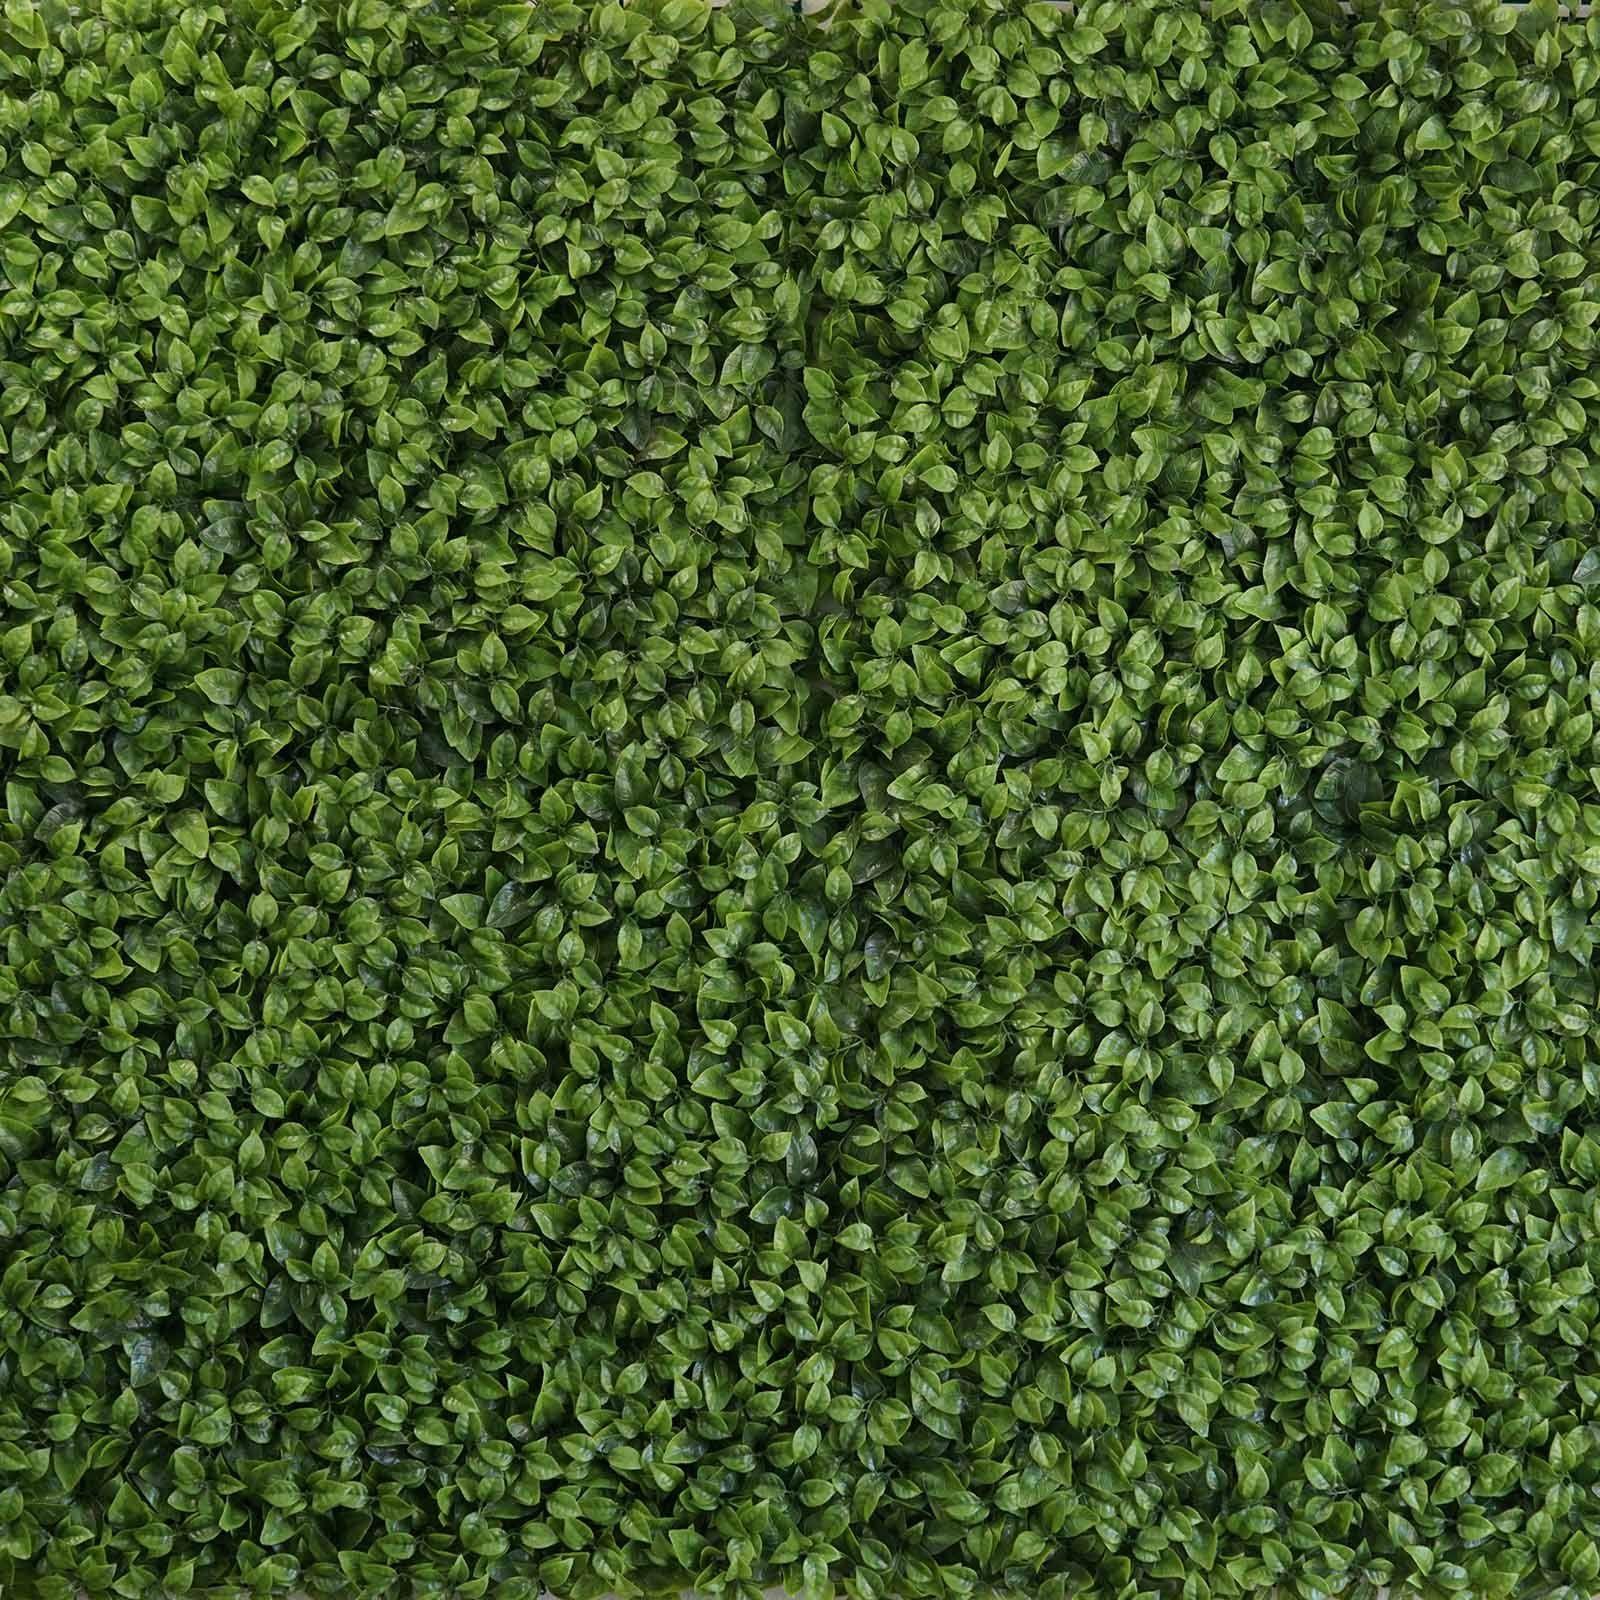 Purple Green Artificial Boxwood Hedge Elliptical Leaves Foliage Wall 4 Panels